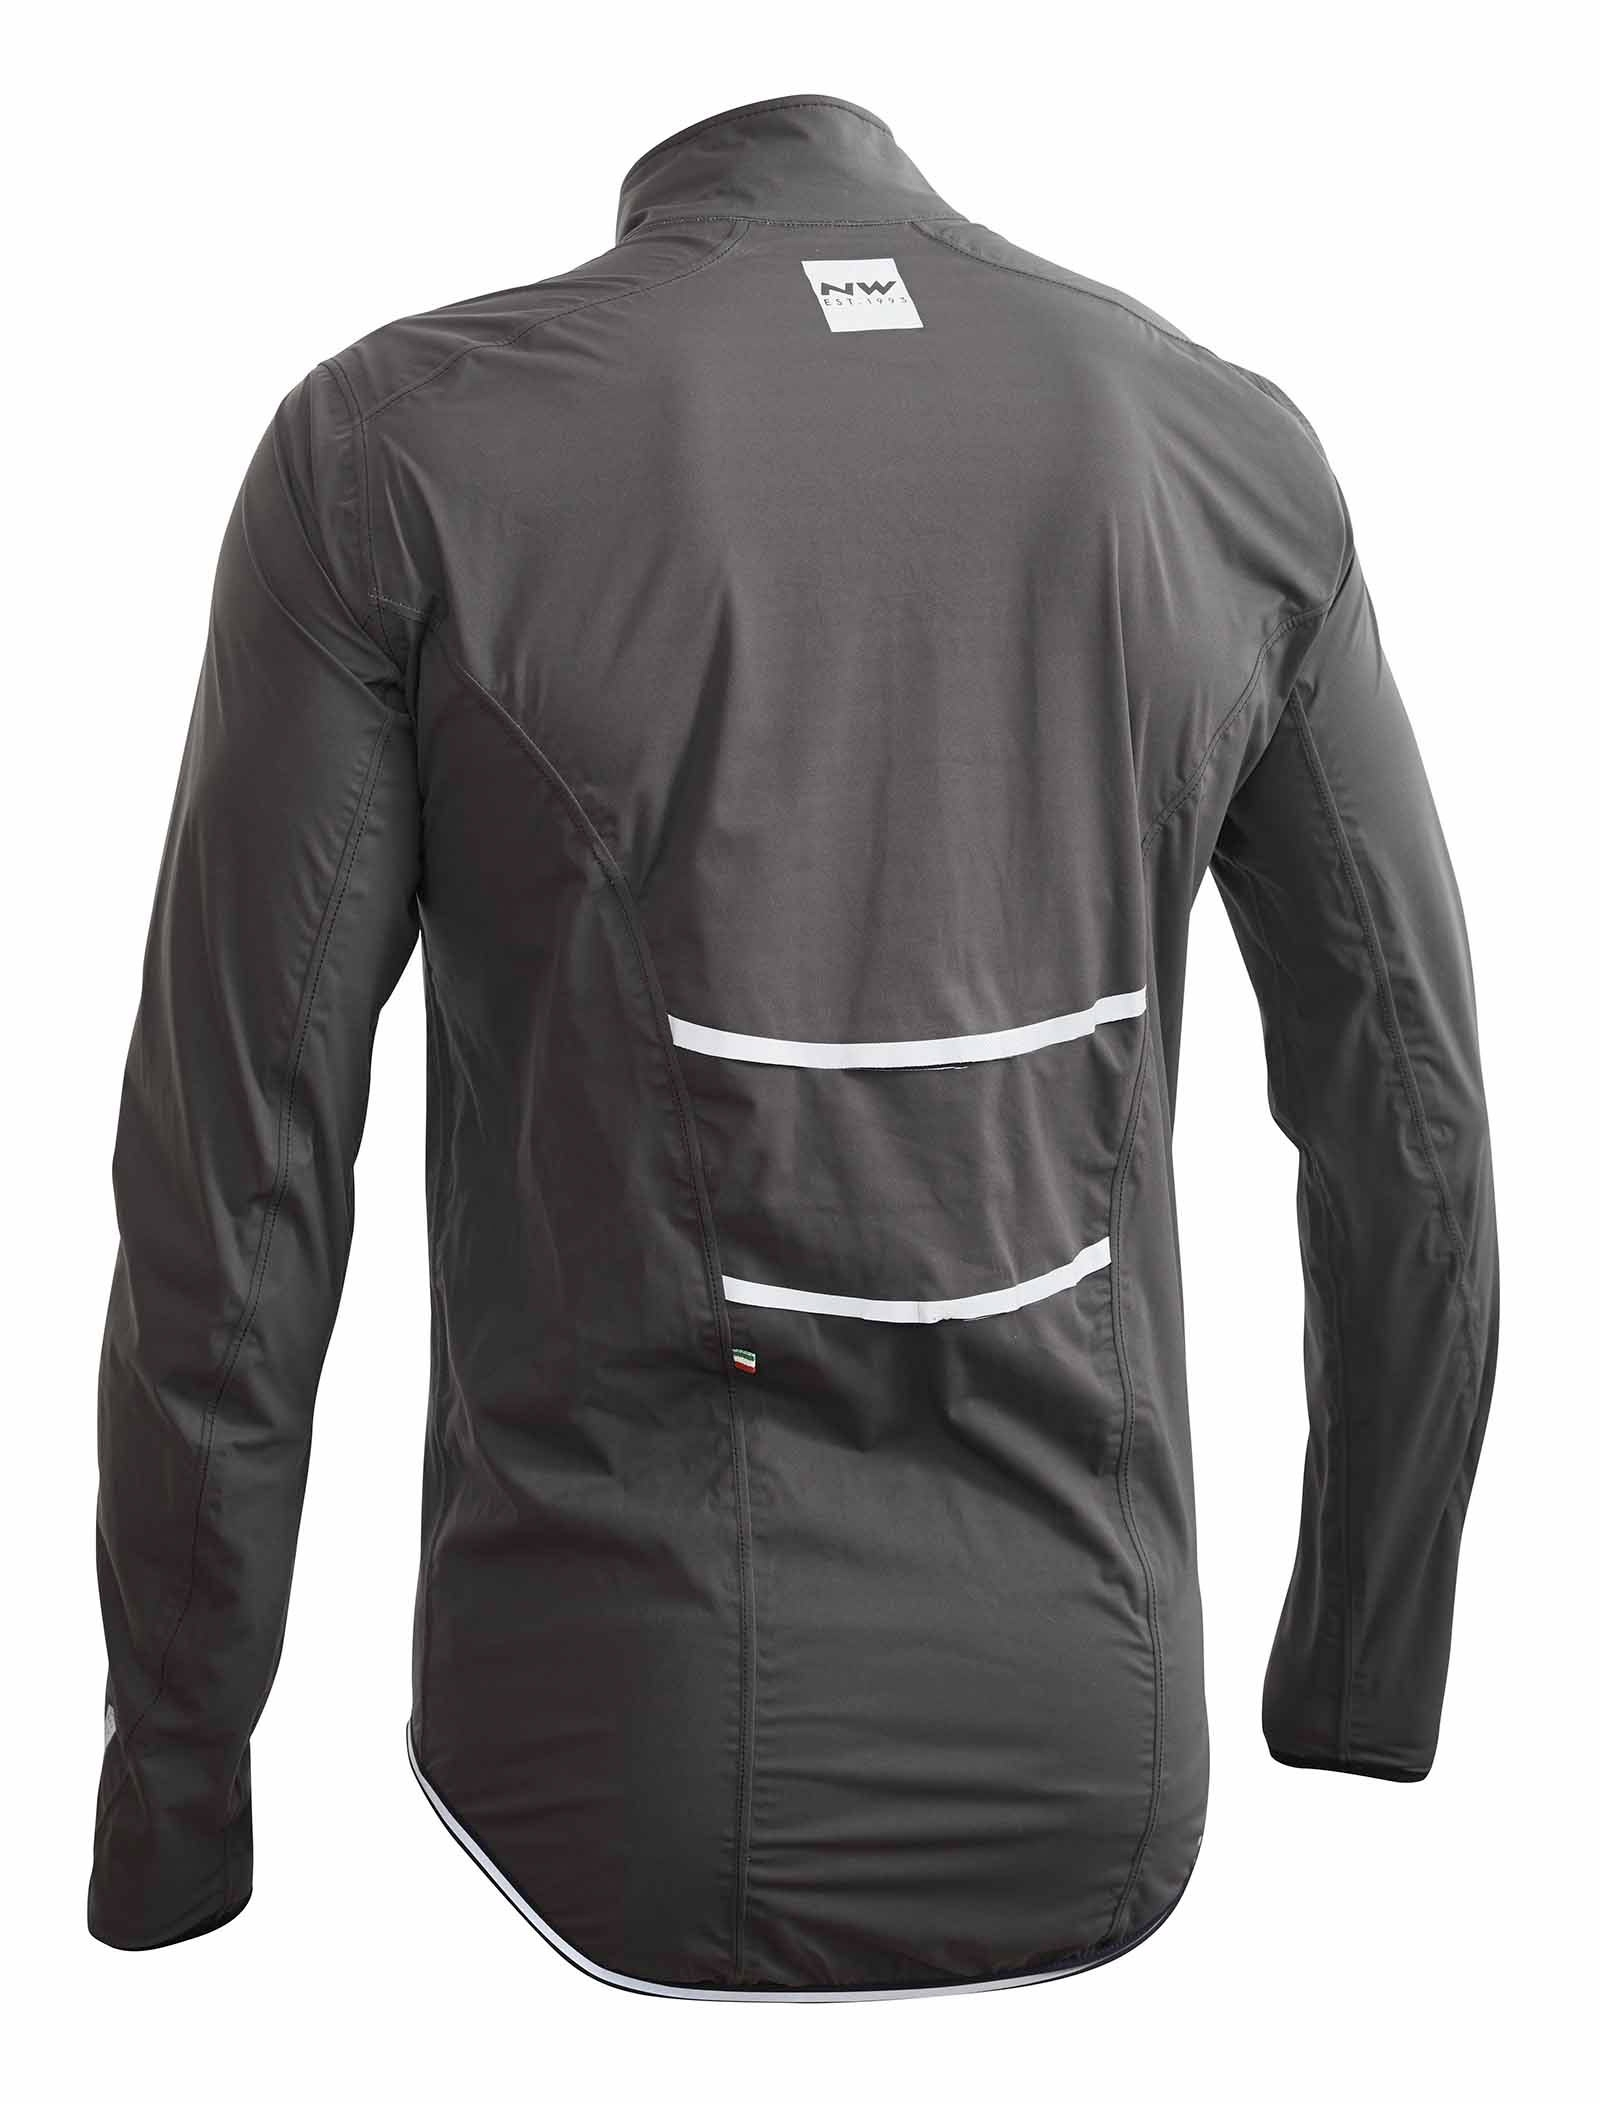 Buy Man Cycling Jacket Rainskin Shield 17619173   Italy2Us.com